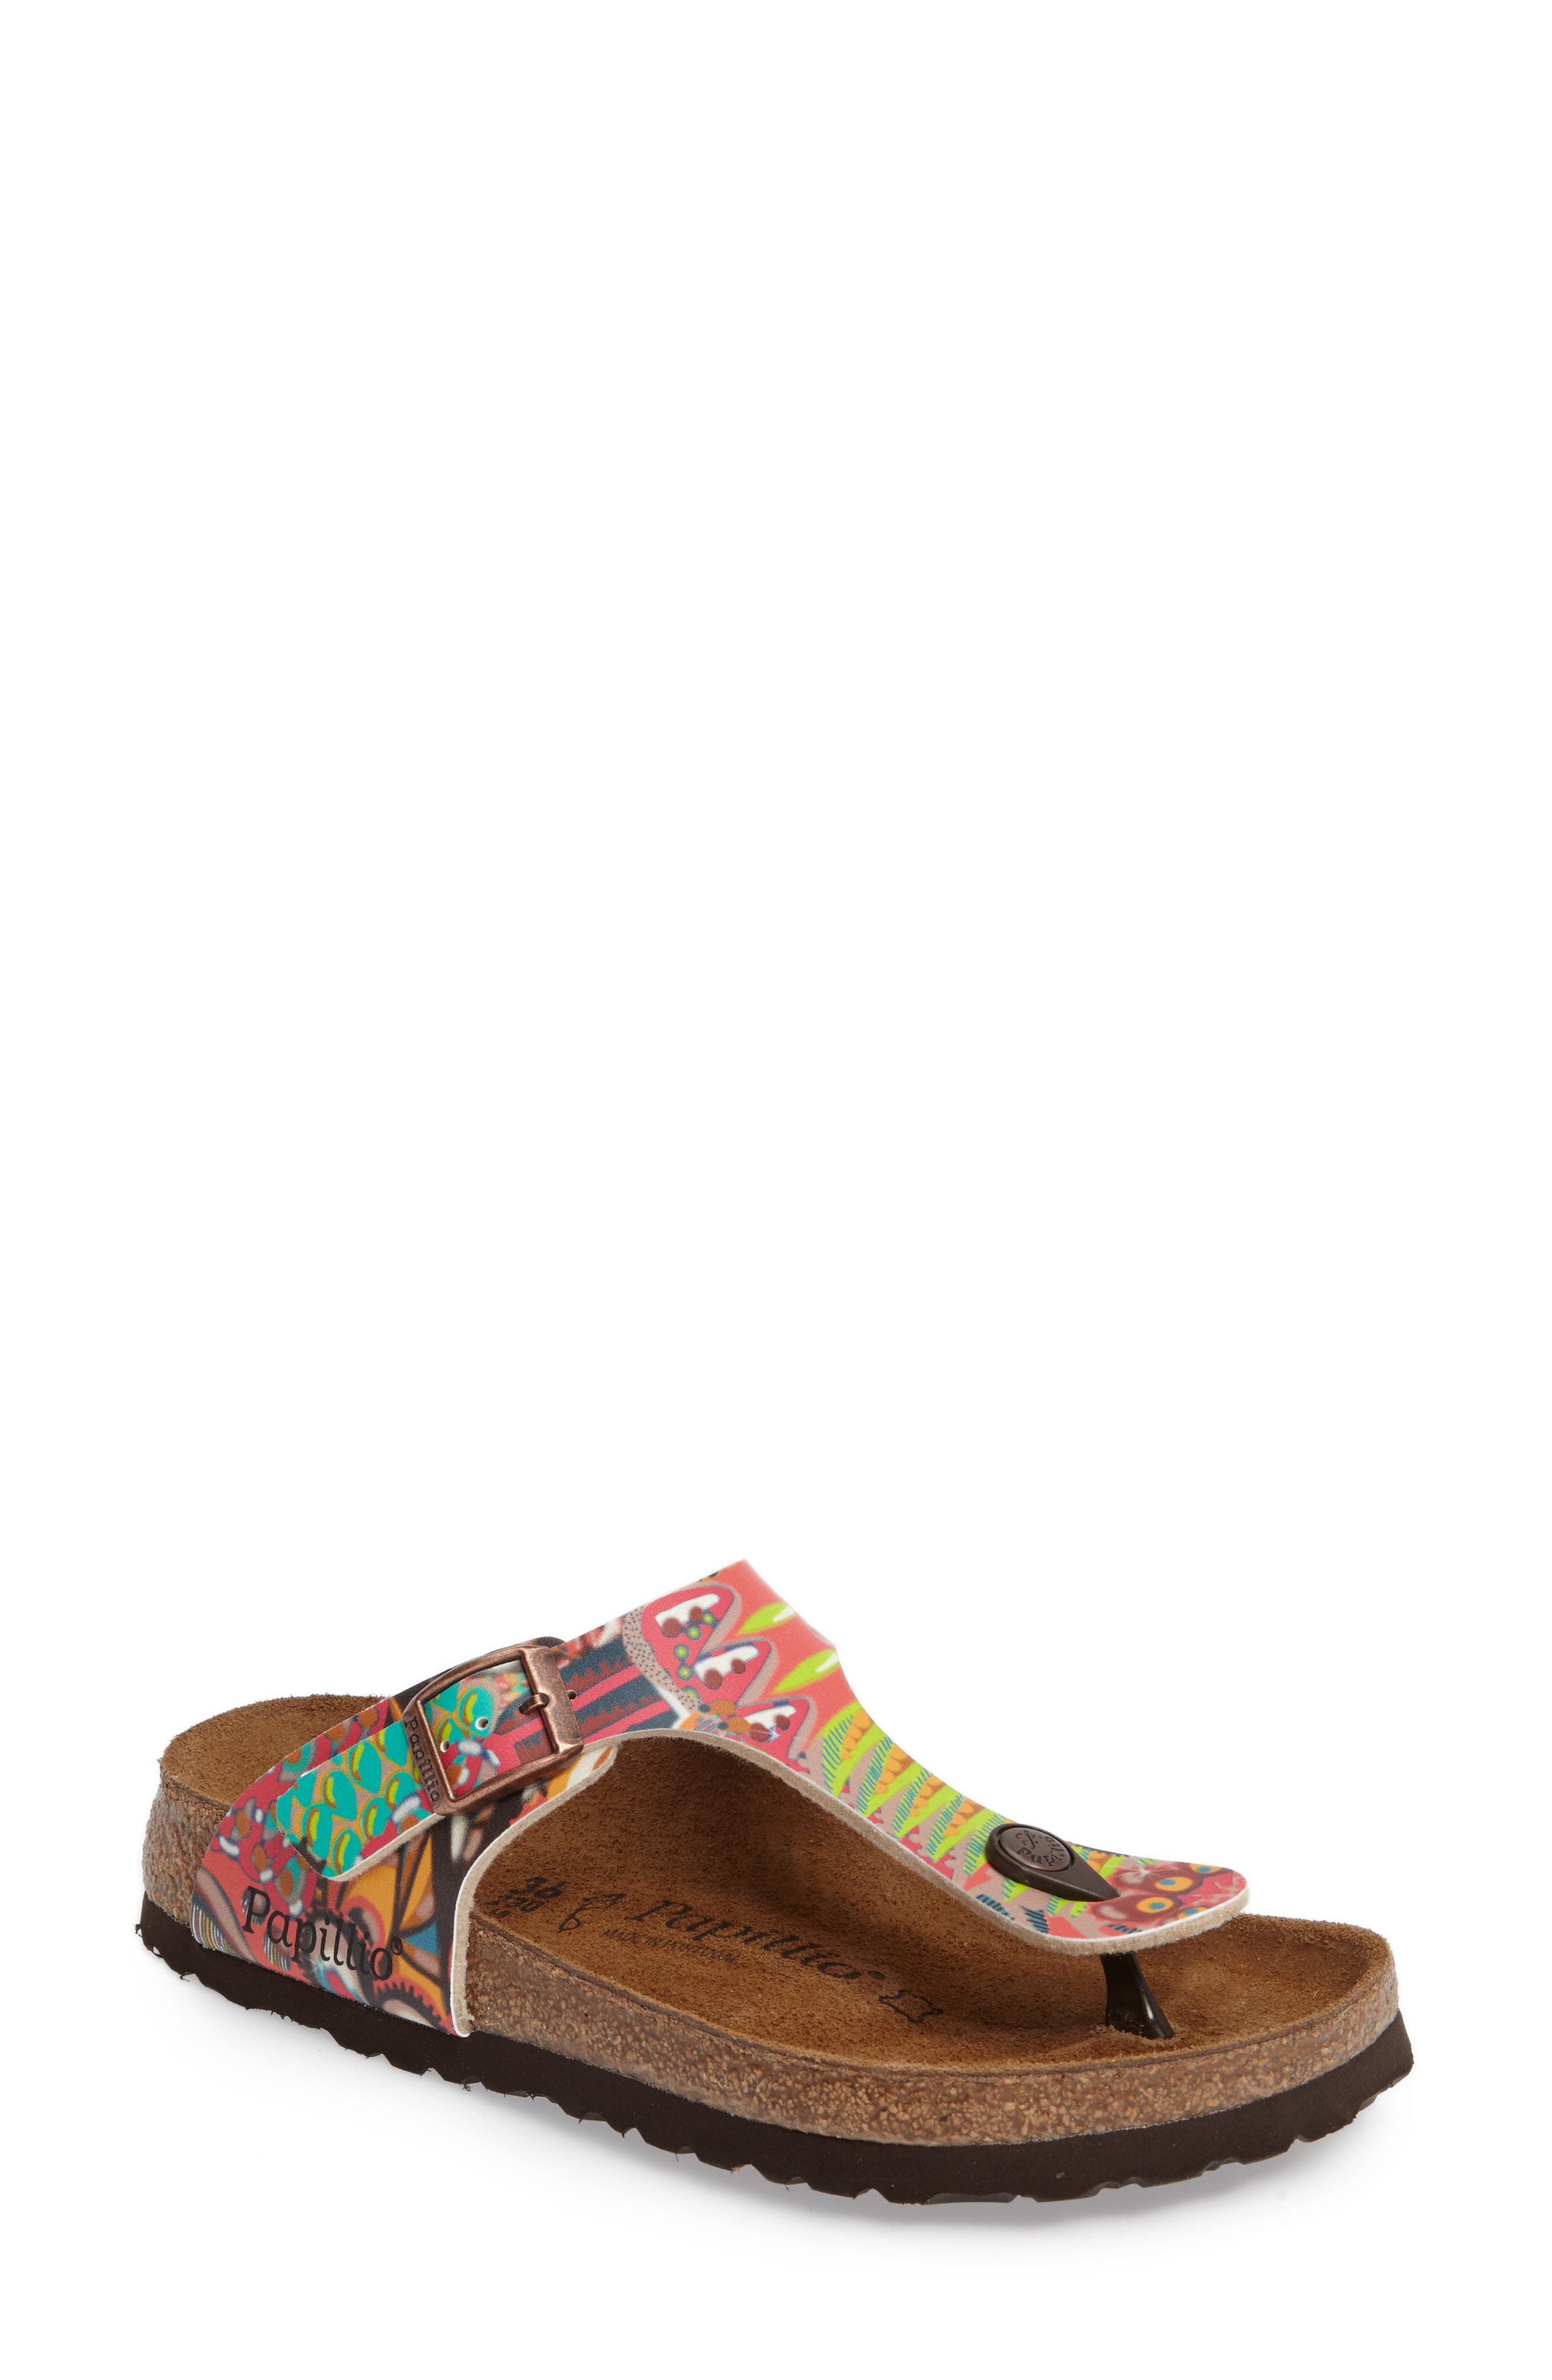 'Gizeh' Sandal,                             Main thumbnail 1, color,                             Raspberry Multi